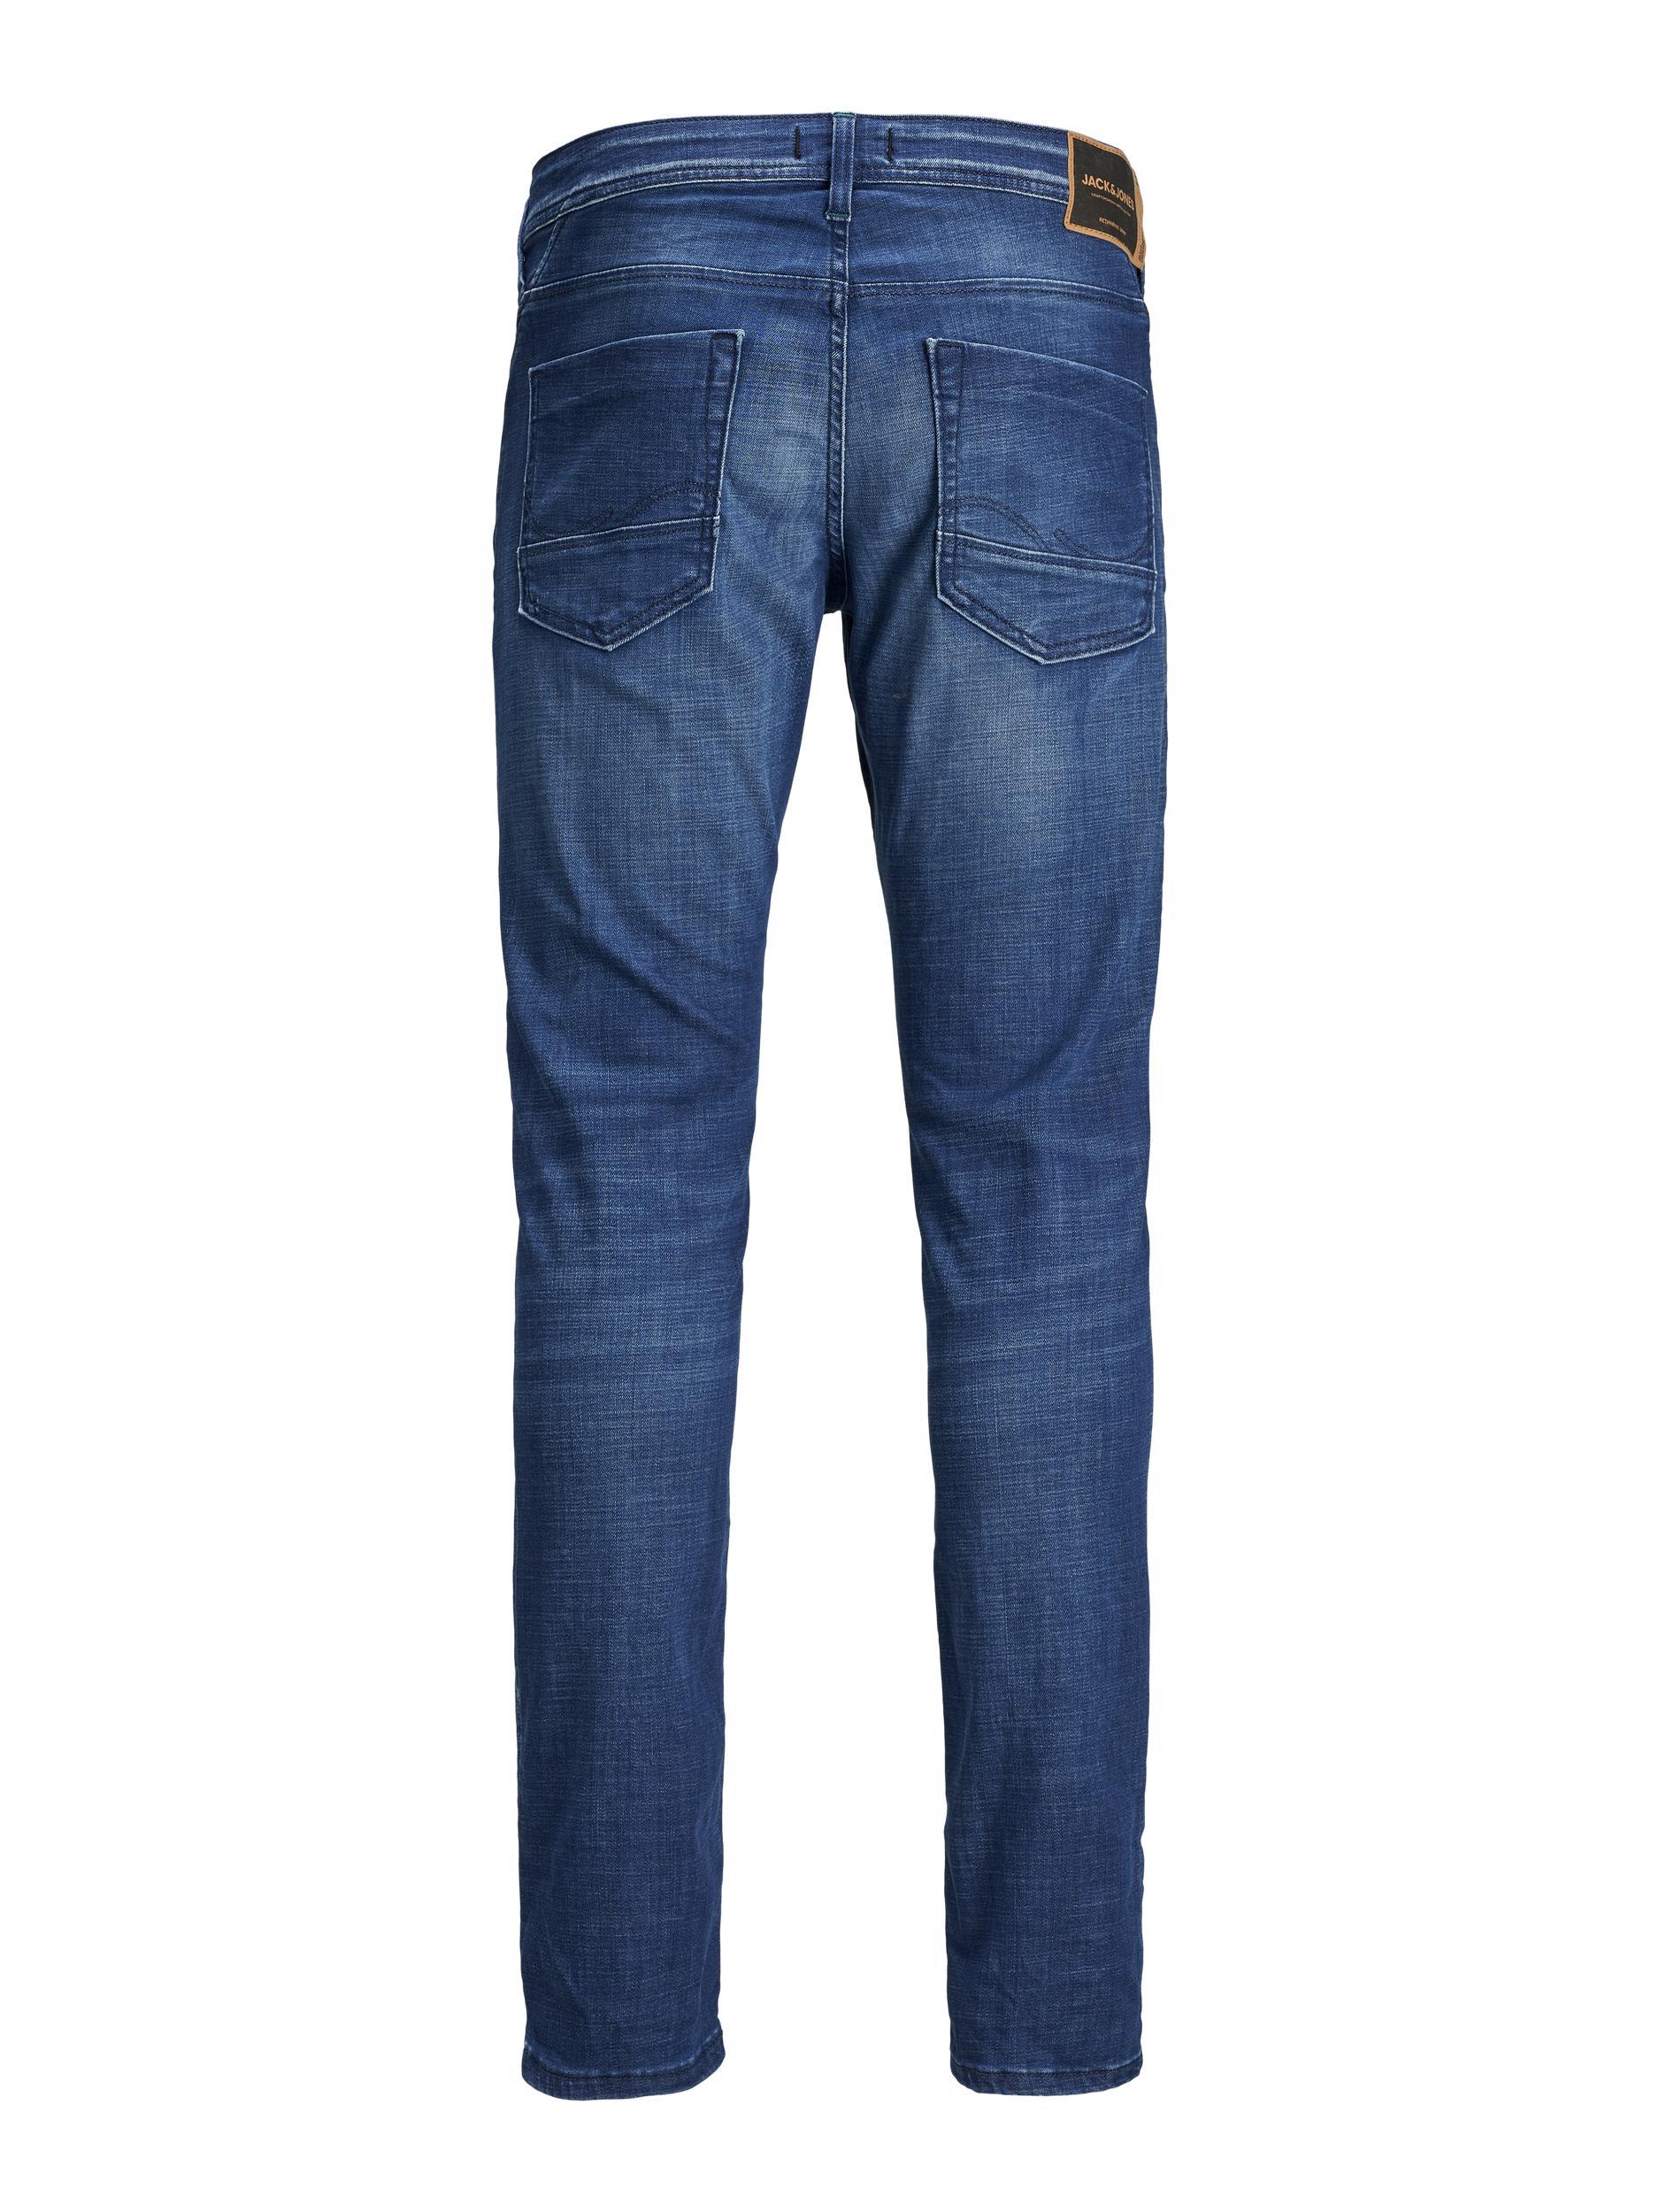 Jack & Jones Glenn Rock jeans, blue denim, 33/36